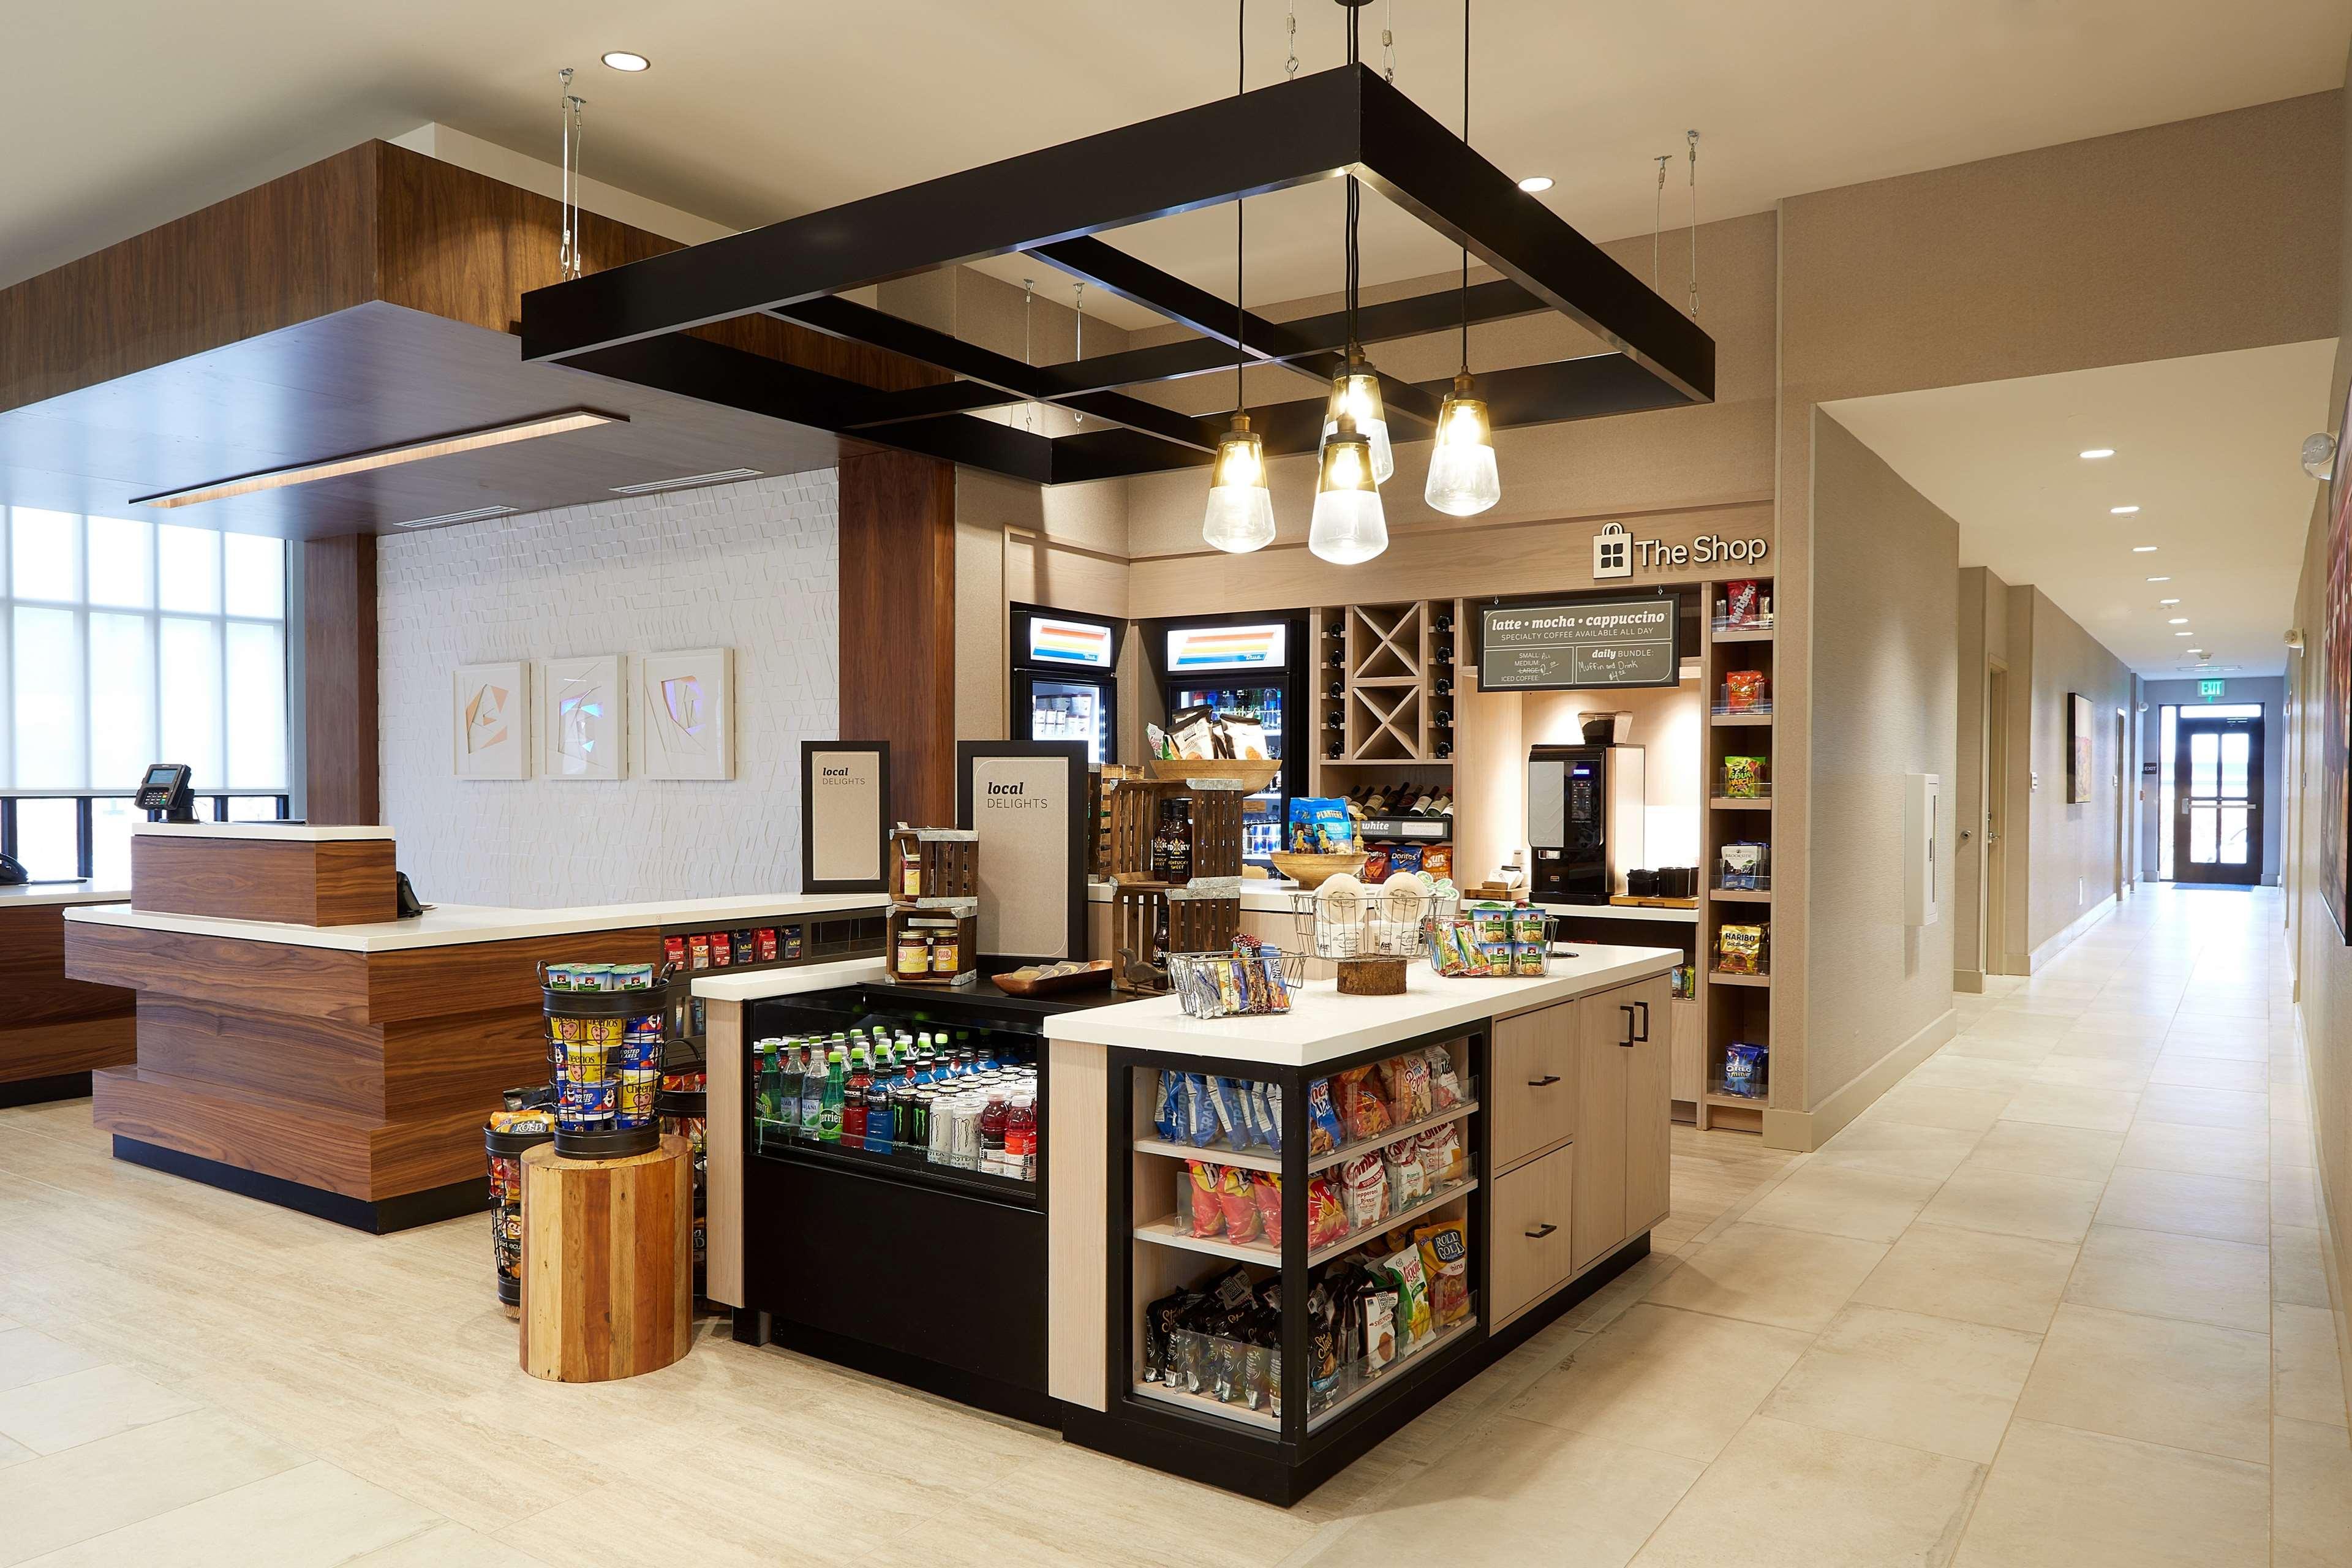 Hilton Garden Inn Elizabethtown image 4